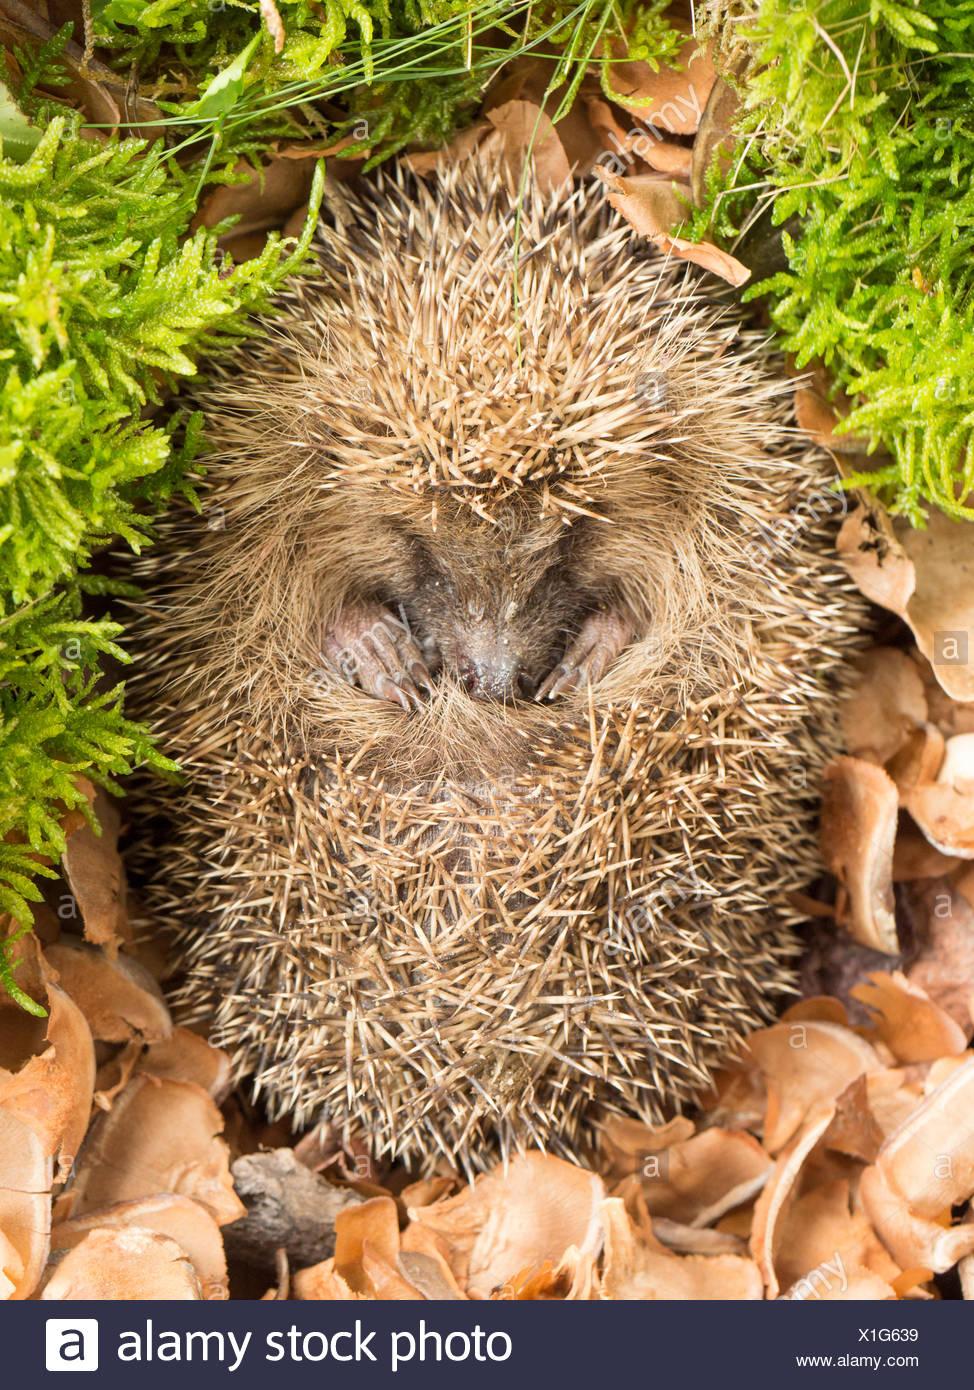 Hedgehog in a garden Stock Photo